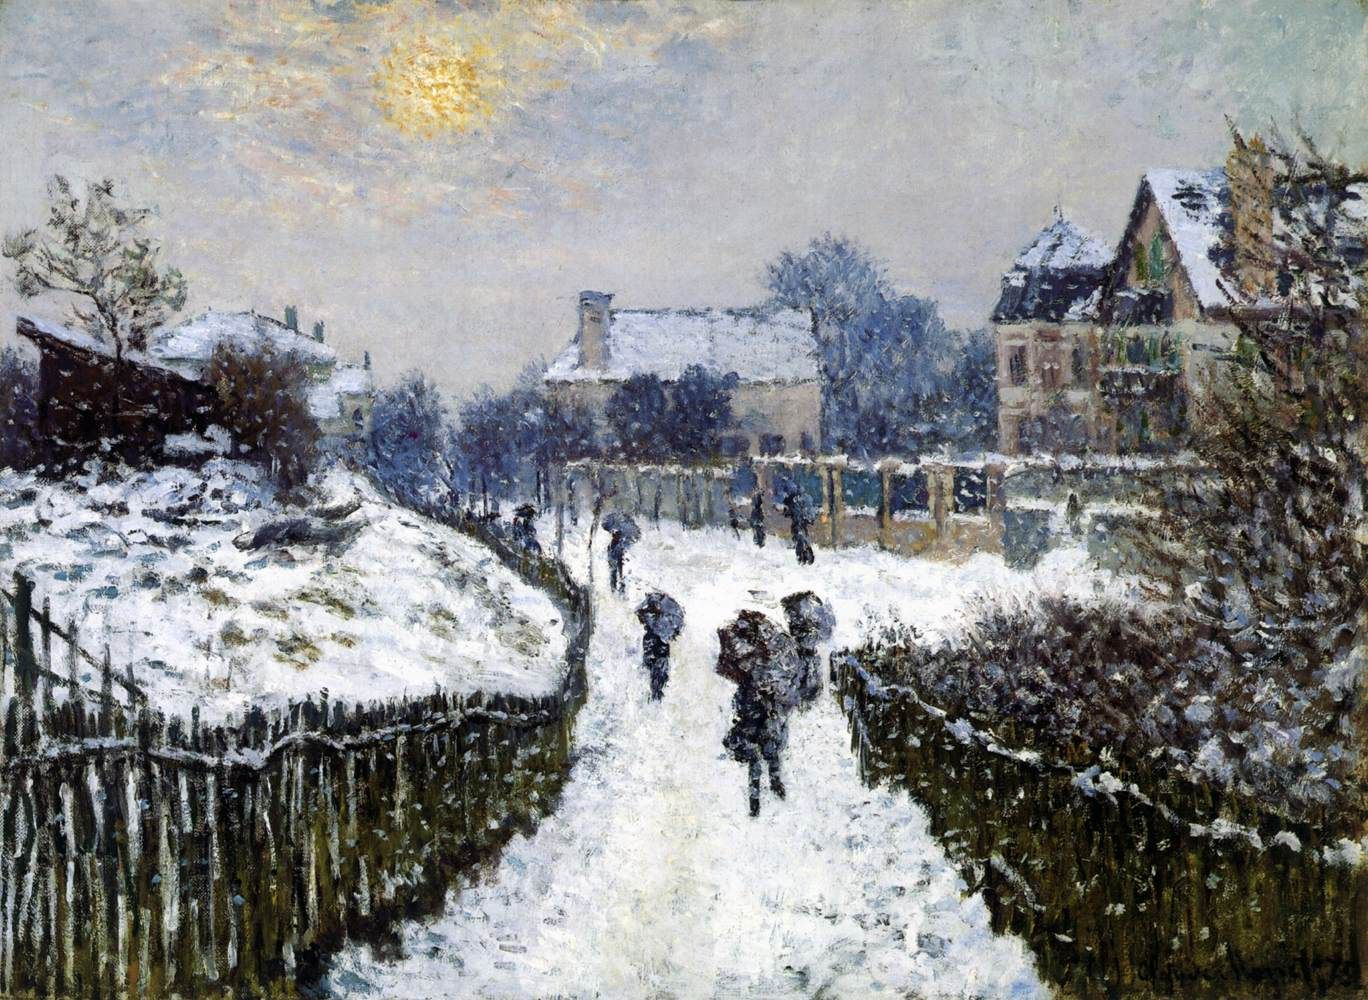 Boulevard Saint-Denis, Argenteuil, in Winter (1875) | Claude Monet, French, 1840-1926 | Oil on canvas, 61 x 82 cm Museum of Fine Arts, Boston